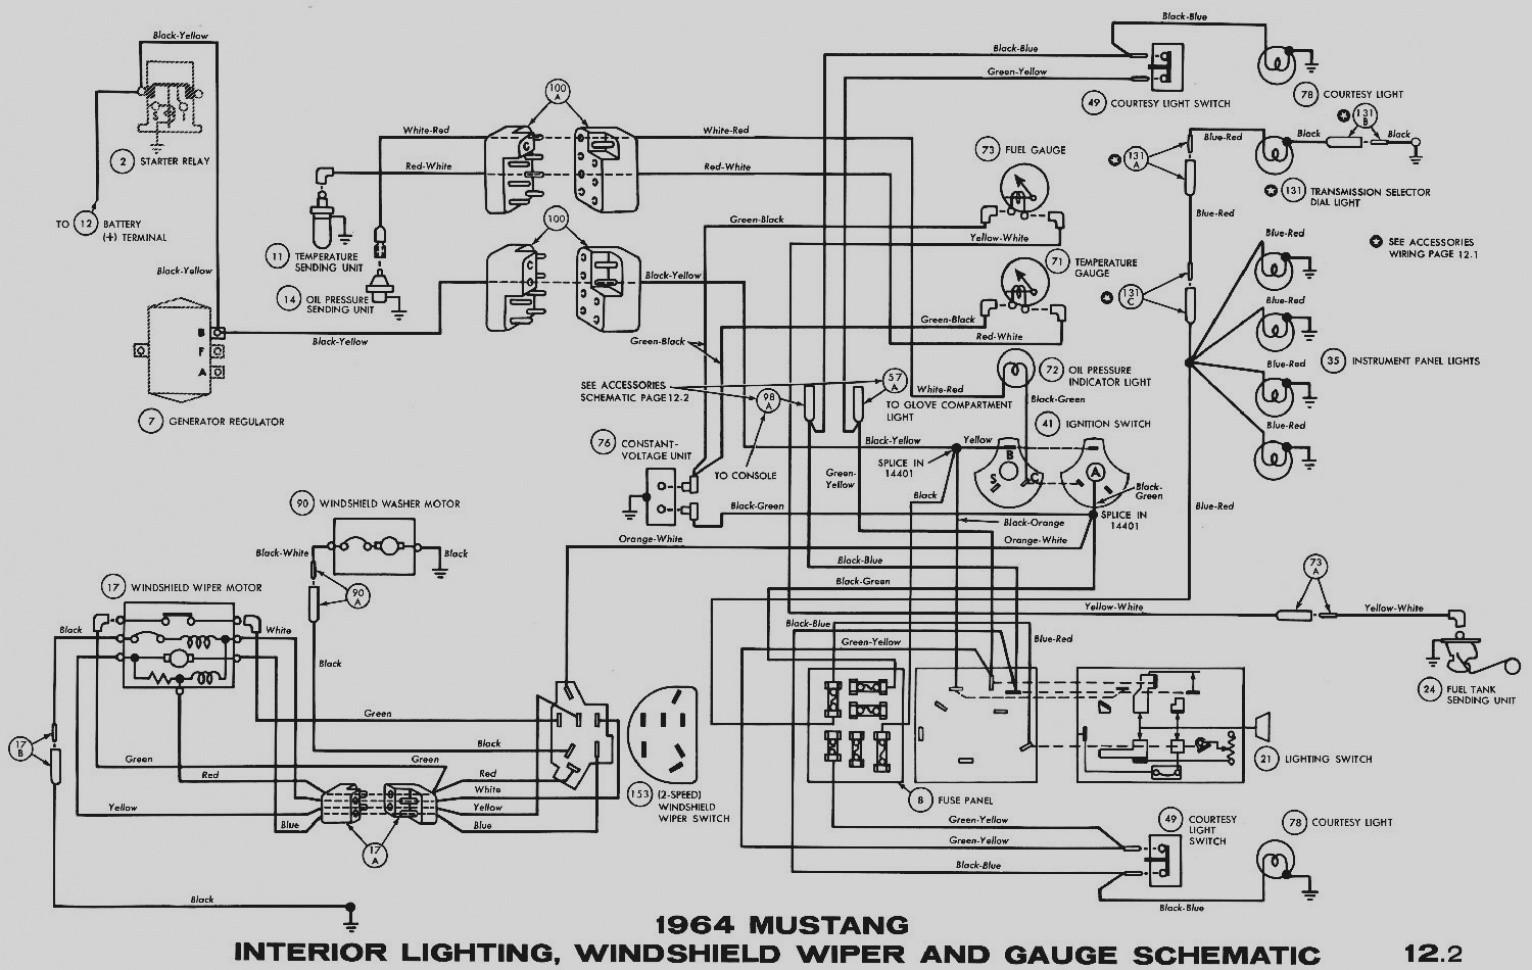 mahindra 2216 wiring diagram all wiring diagram  mahindra 2216 wiring diagram #3